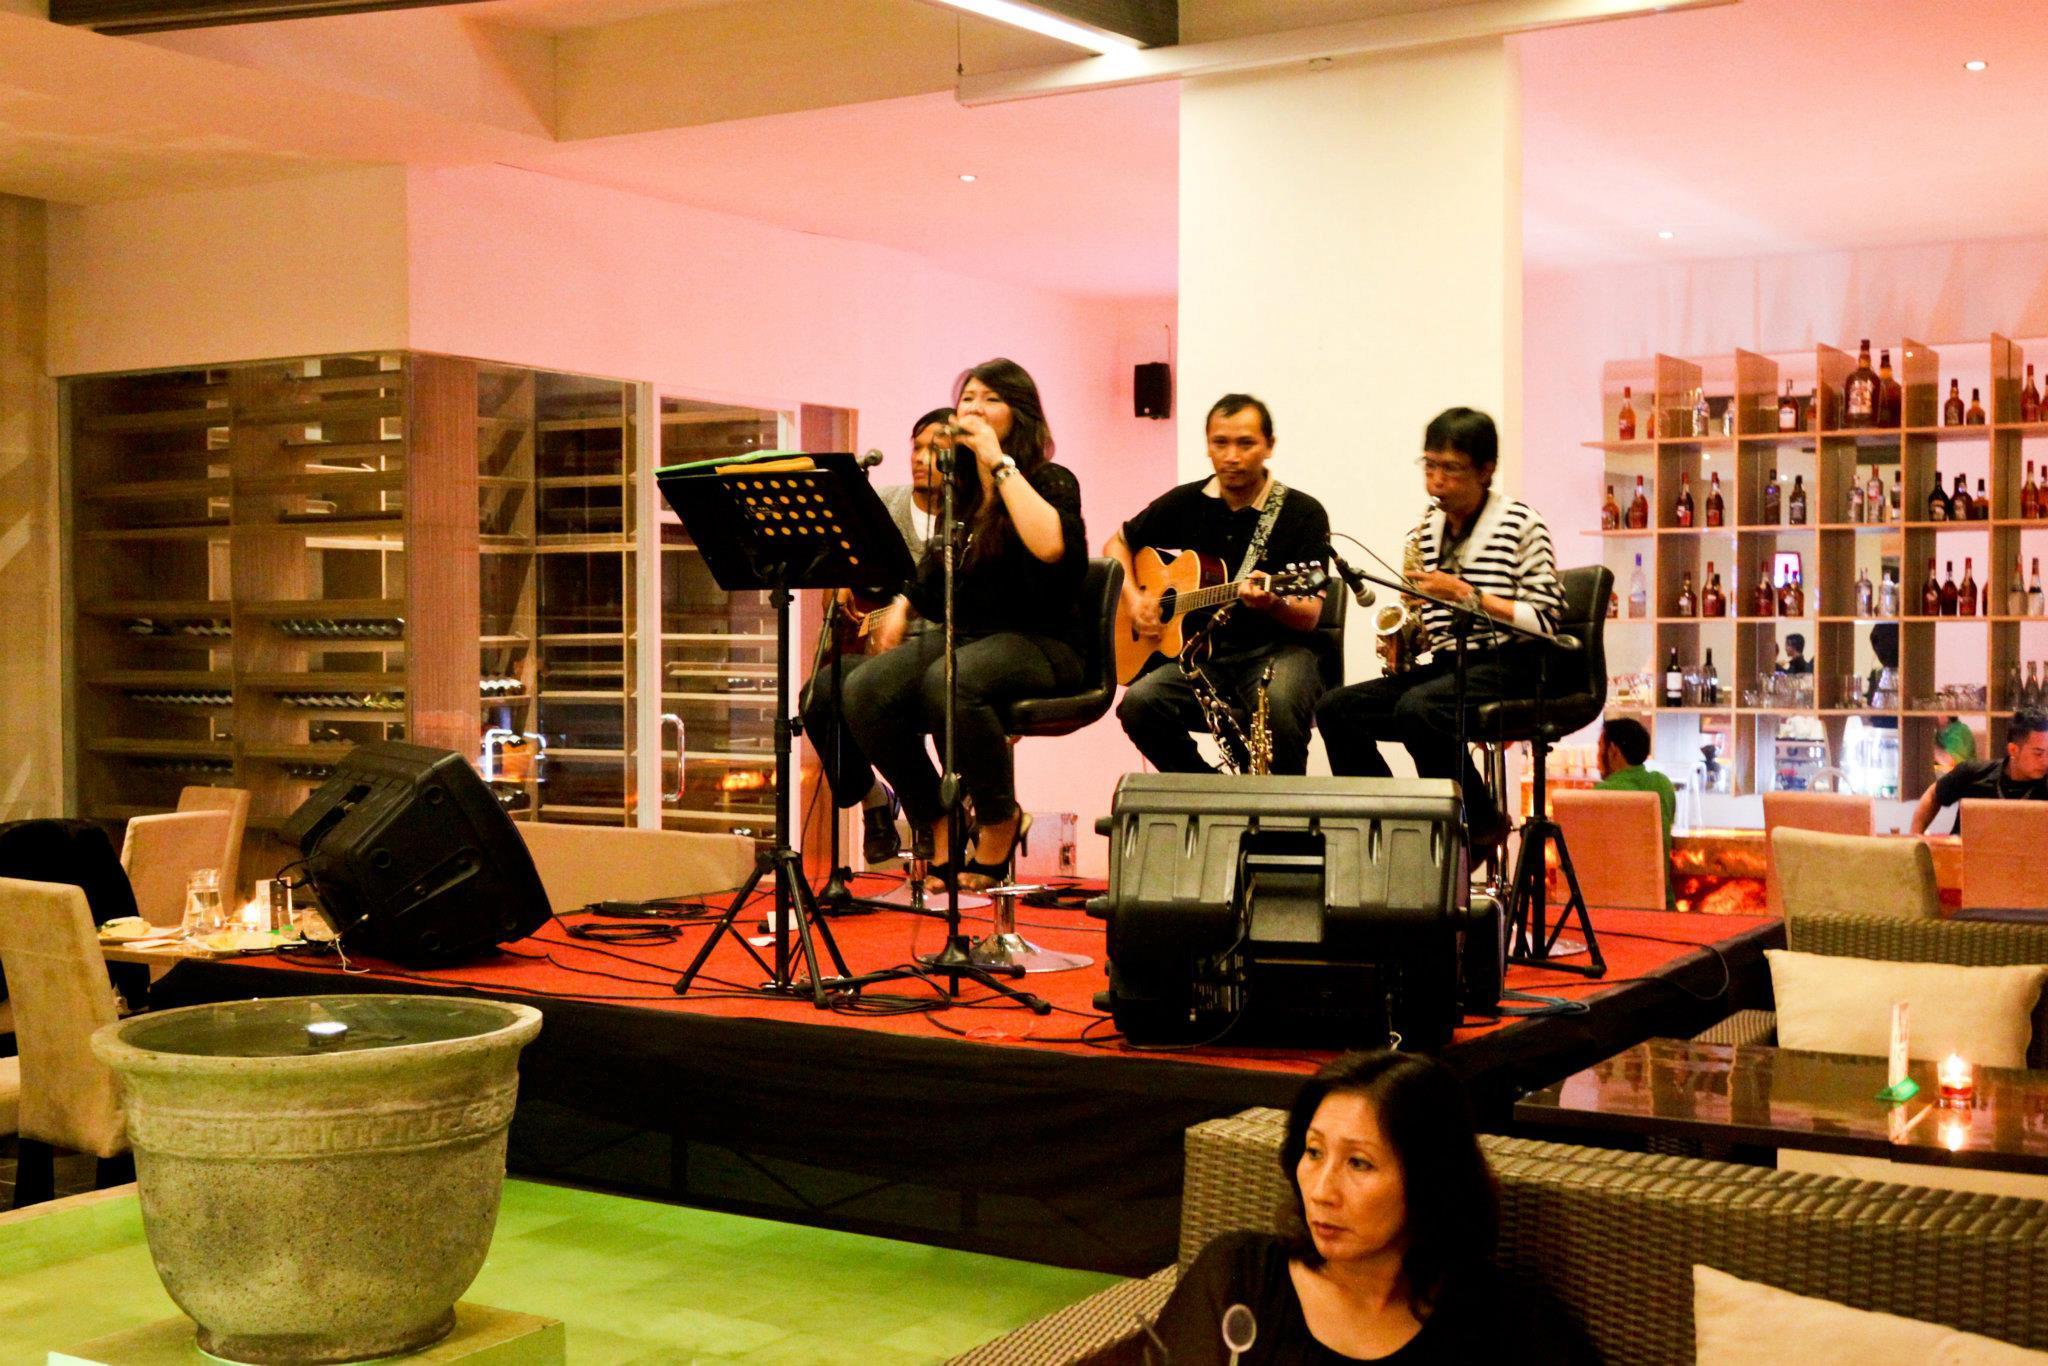 Penampilan live music di sebuah cafe Via: bandung.panduanwisata.id